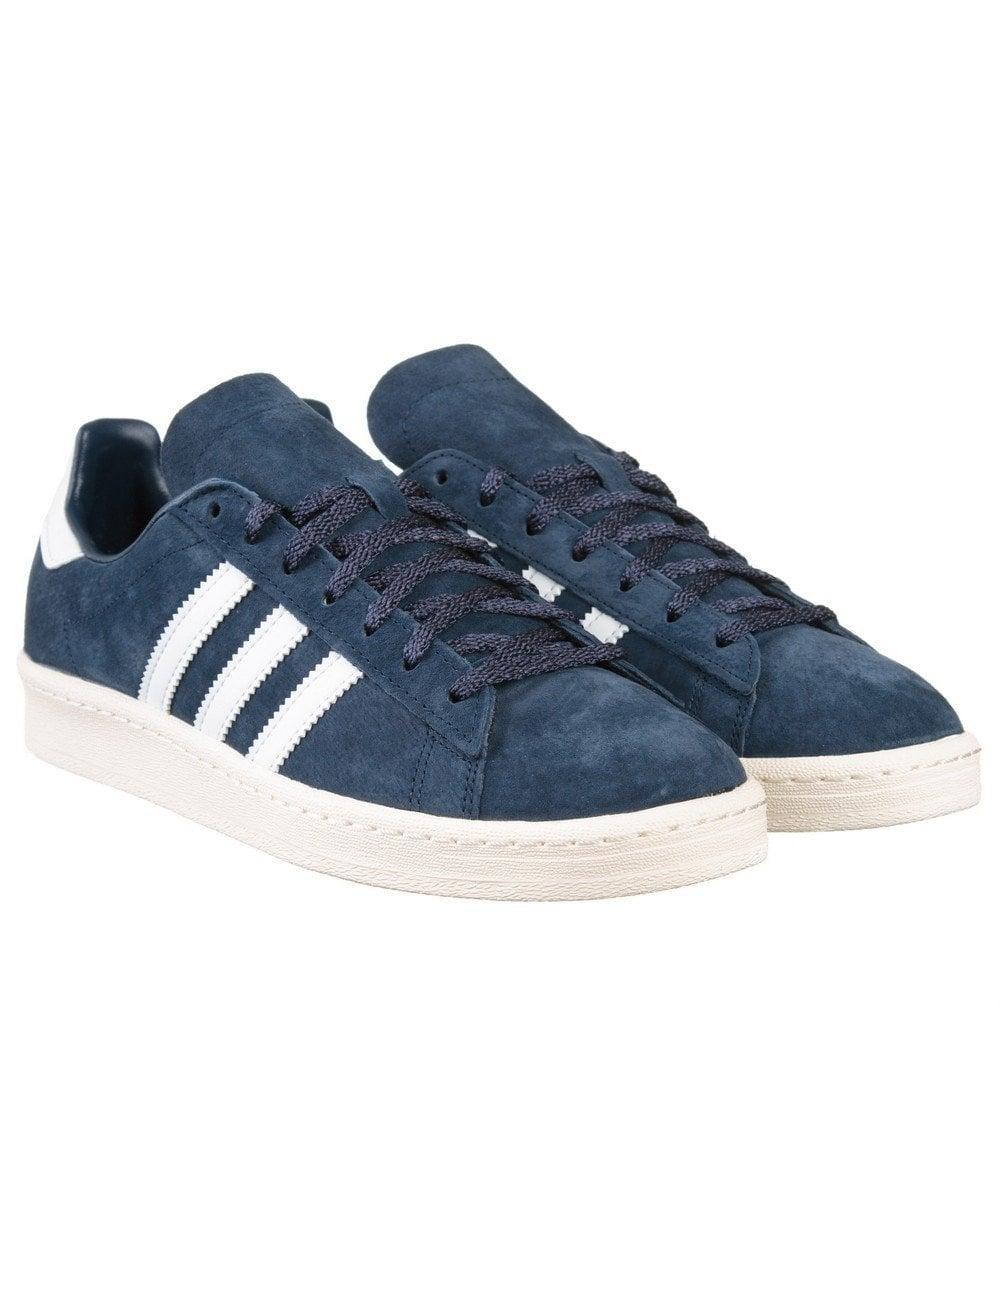 80s Vintage Shoes Dark Adidas Campus Originals Japan Blue FJ1culK3T